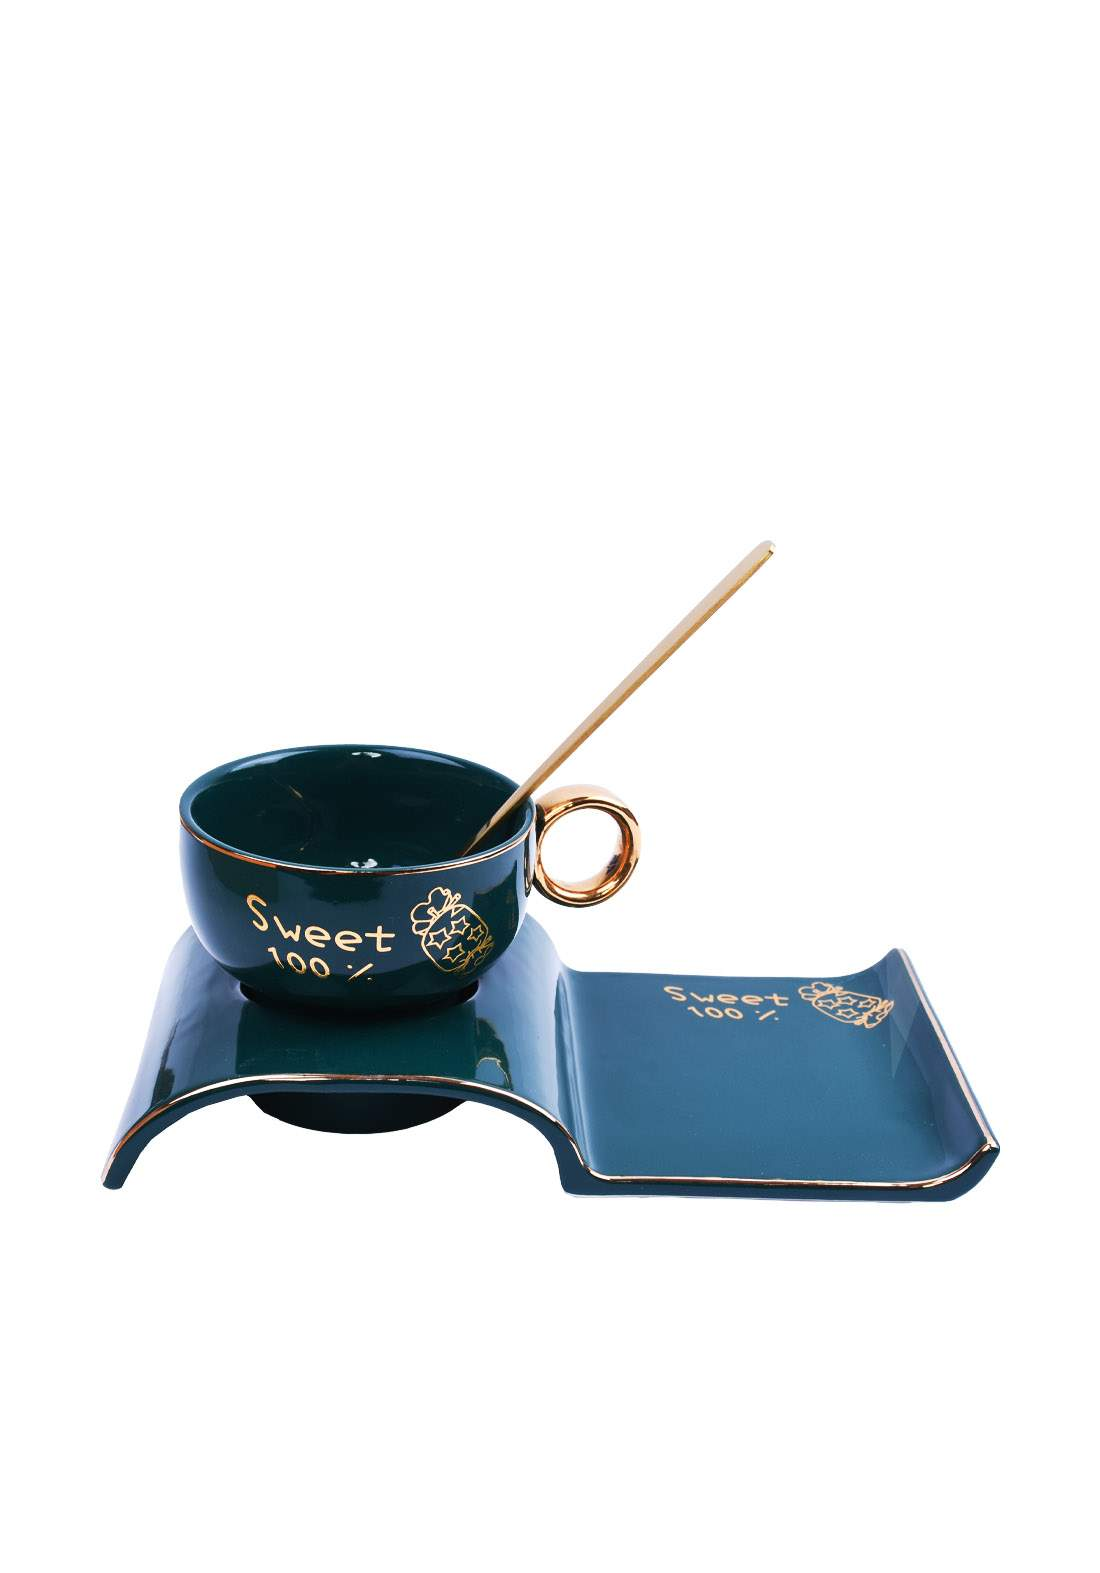 cup of coffee كوب قهوة اخضر اللون